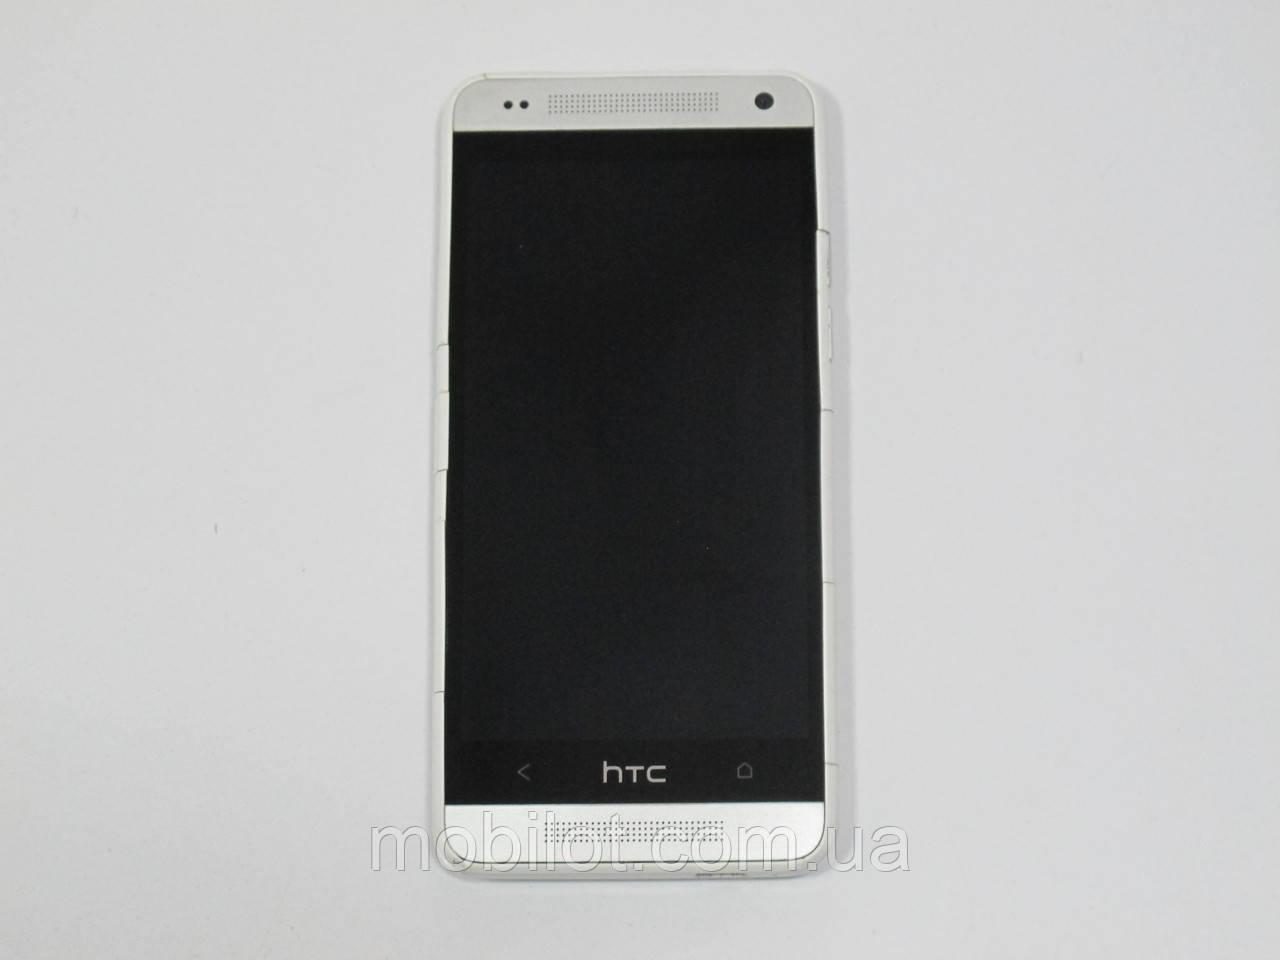 Мобильный телефон HTC One mini 601n (TZ-4518)